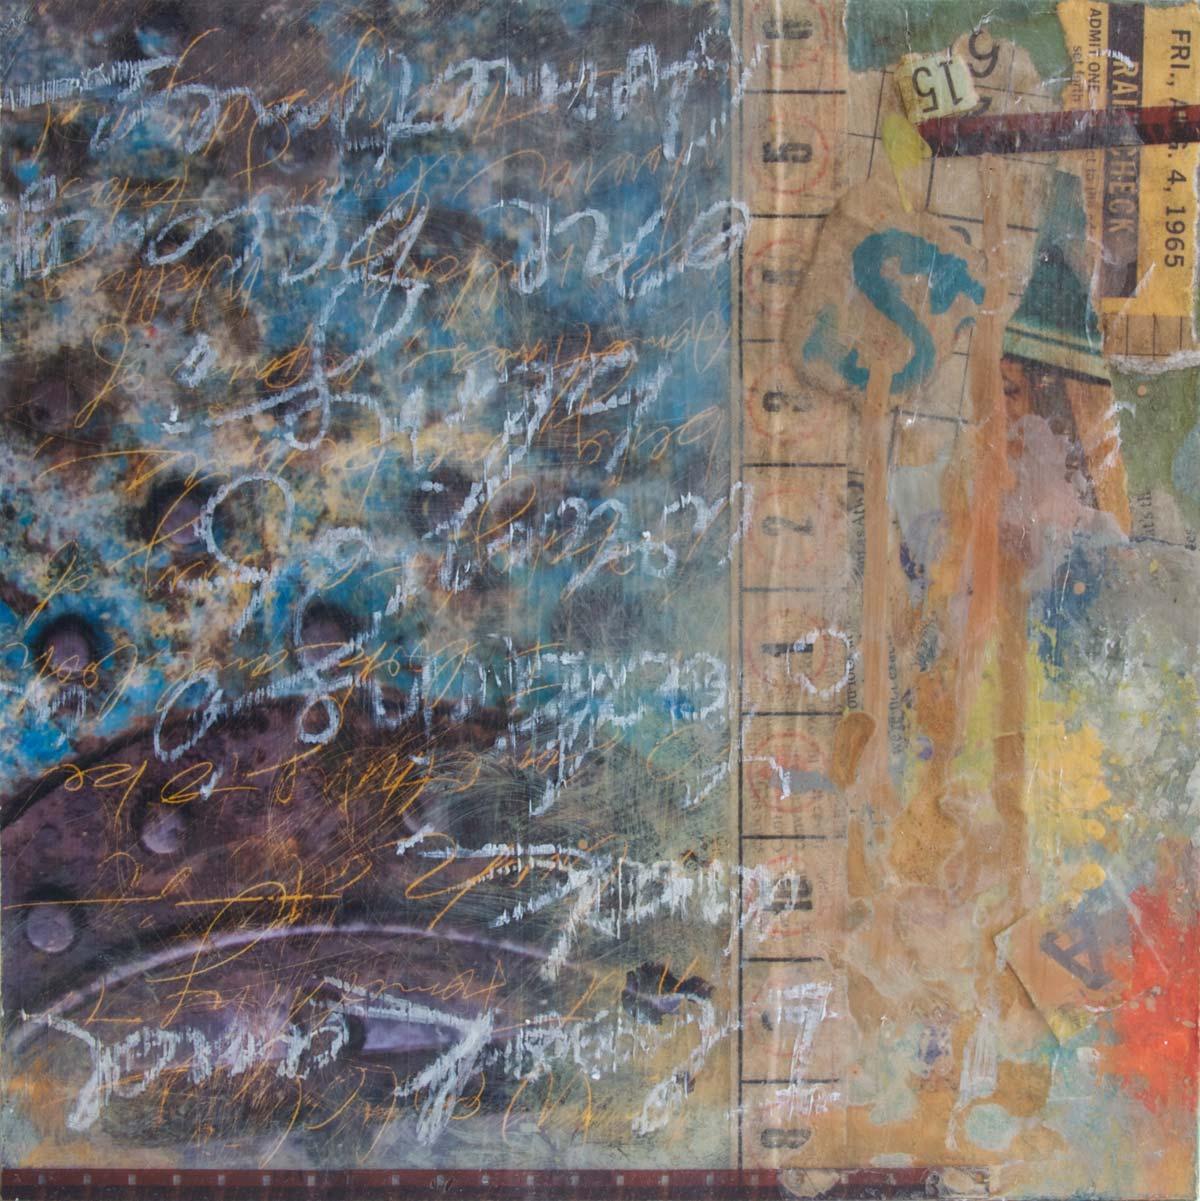 "A Pair of Eyes Walking, 2012, mixed media on wood, 8"" x 8"""